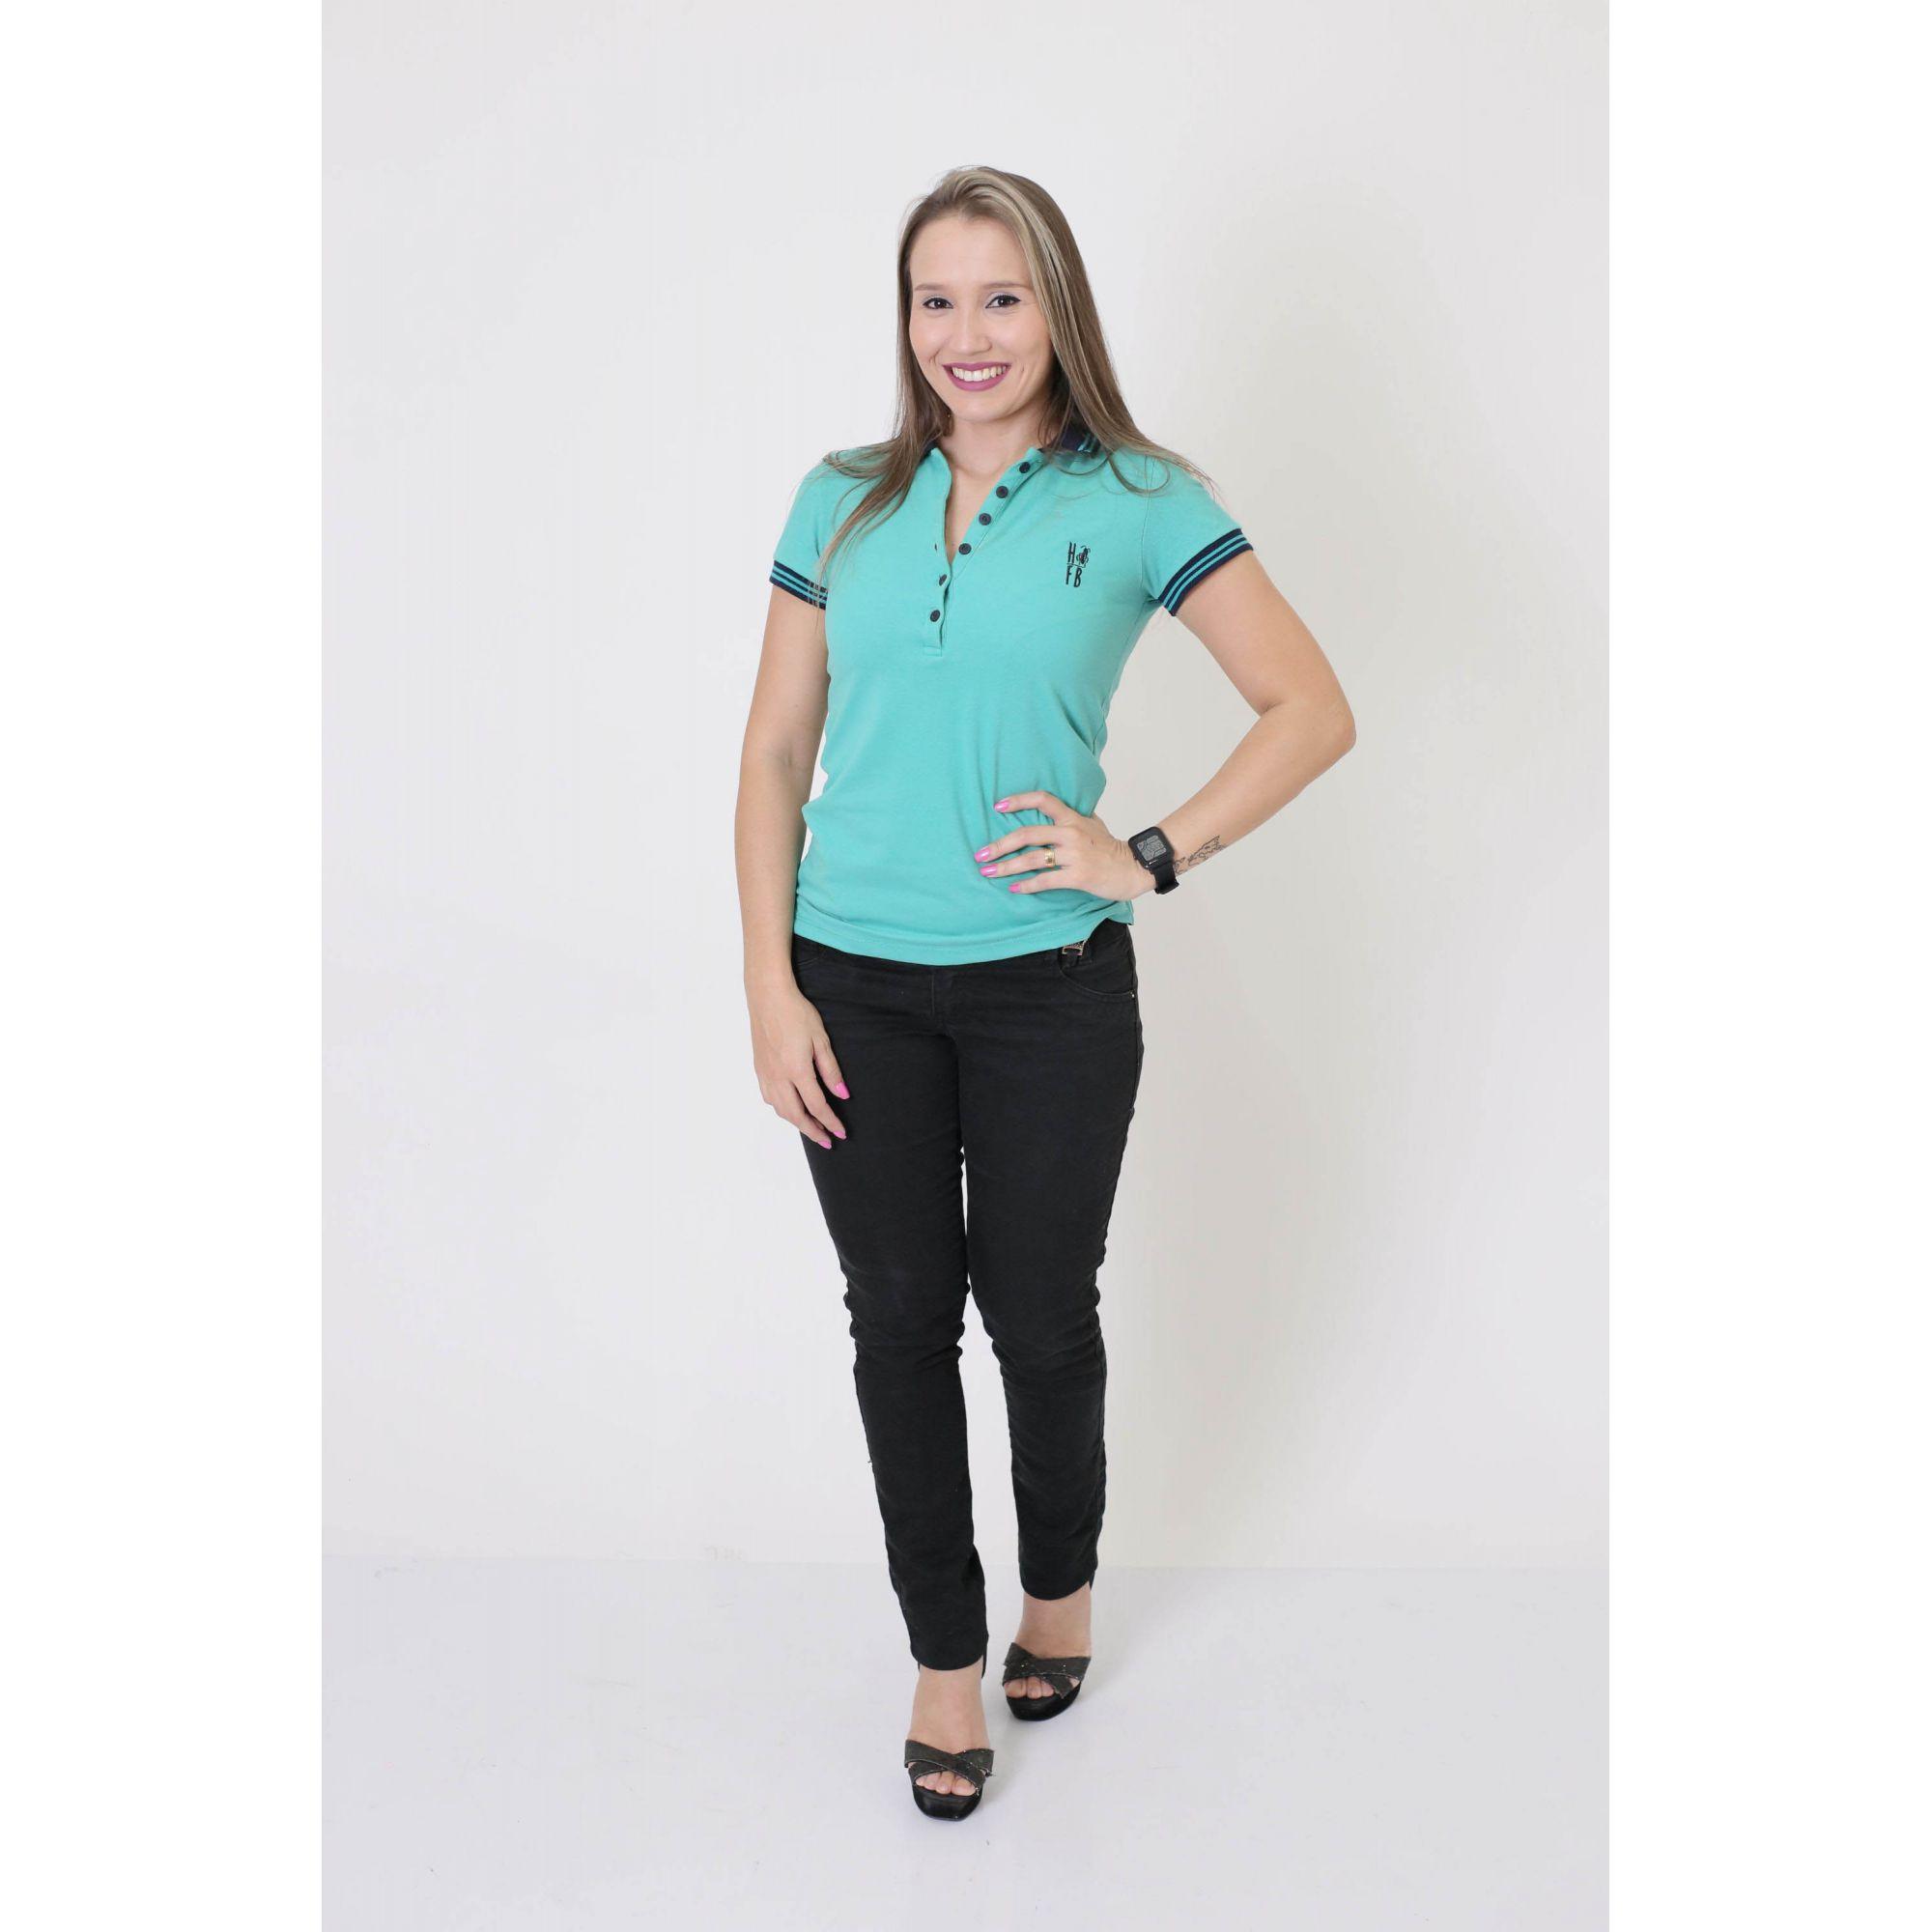 Camisa Polo Feminina Verde Jade  - Heitor Fashion Brazil